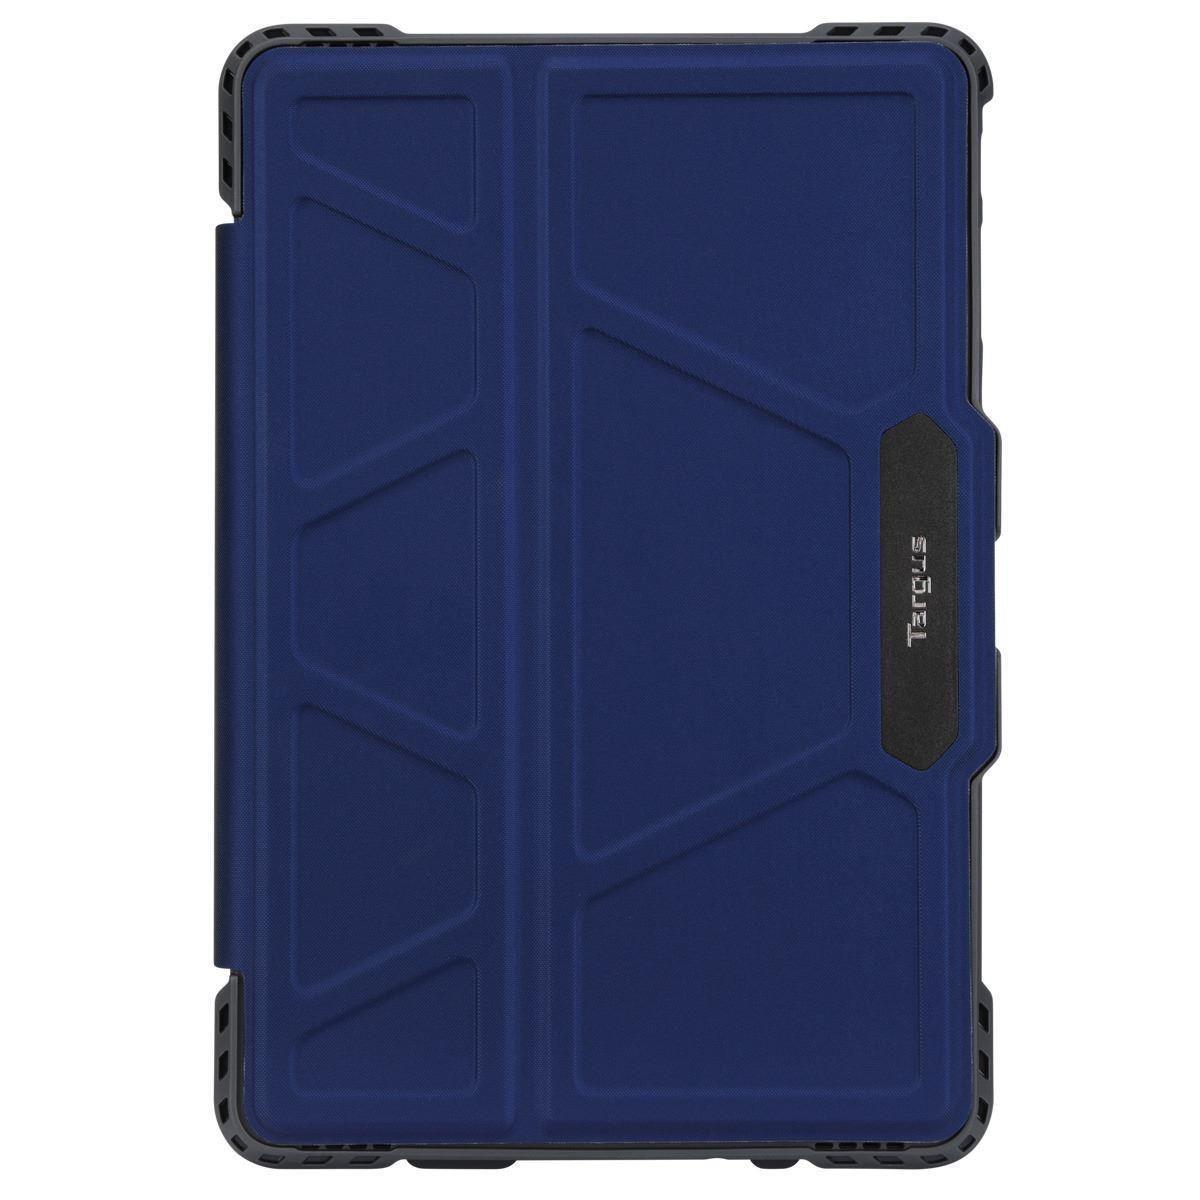 Targus Pro-Tek Rotating Case (Blue) for Samsung Galaxy Tab S4 (10.5 inch)